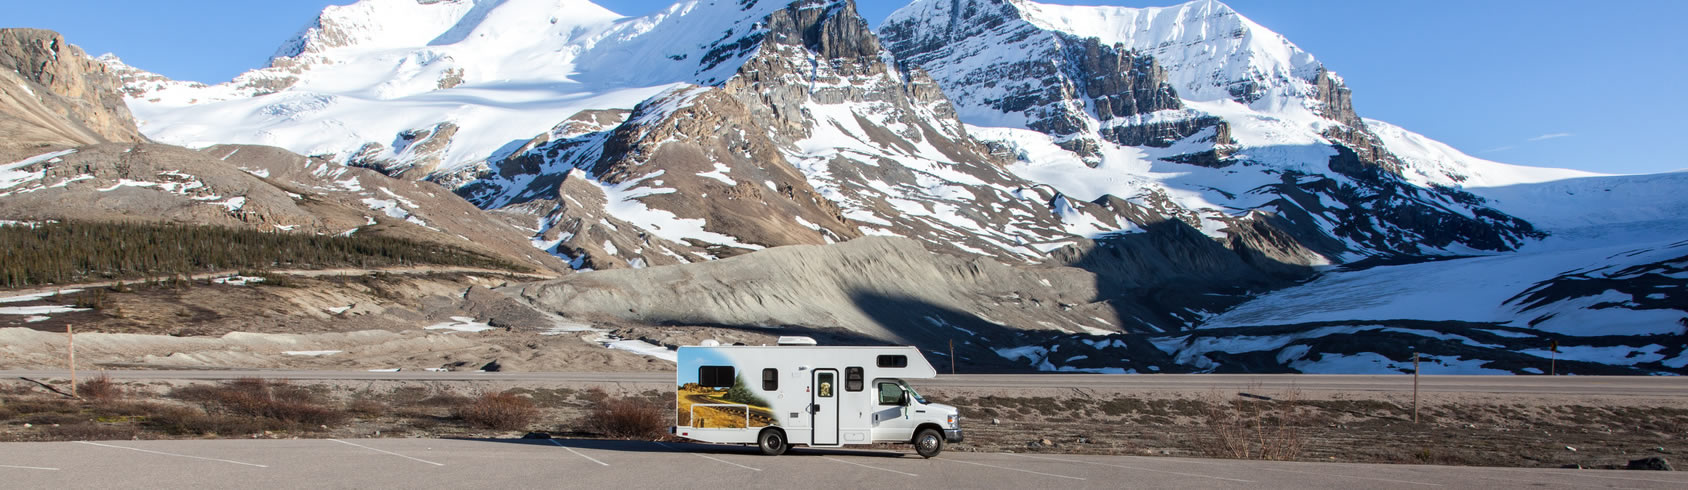 wohnmobil usa mieten wohnmobil kanada wohnmobil reisen. Black Bedroom Furniture Sets. Home Design Ideas